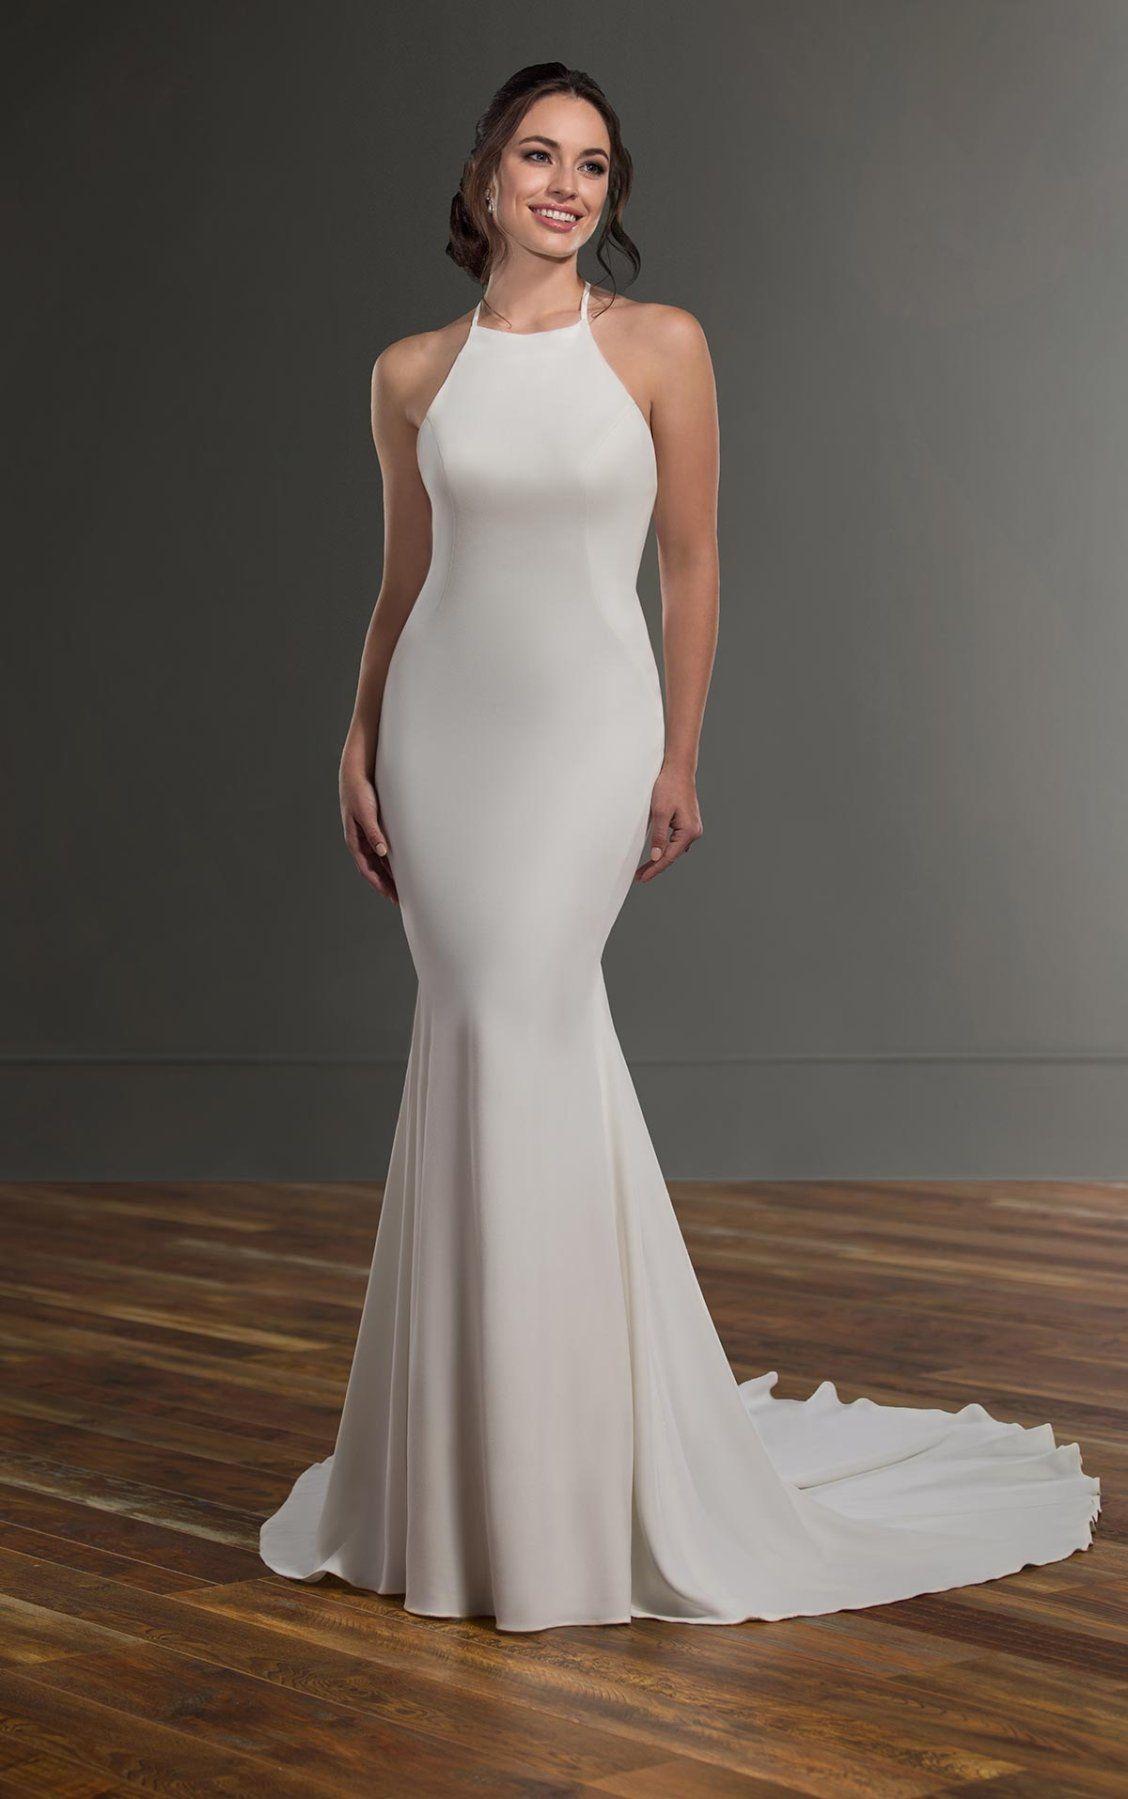 Simple Crepe Wedding Dress With Cross Back Martina Liana Wedding Dresses Discontinued Martina Liana Wedding Dress Wedding Dresses Crepe Wedding Dress [ 1799 x 1128 Pixel ]